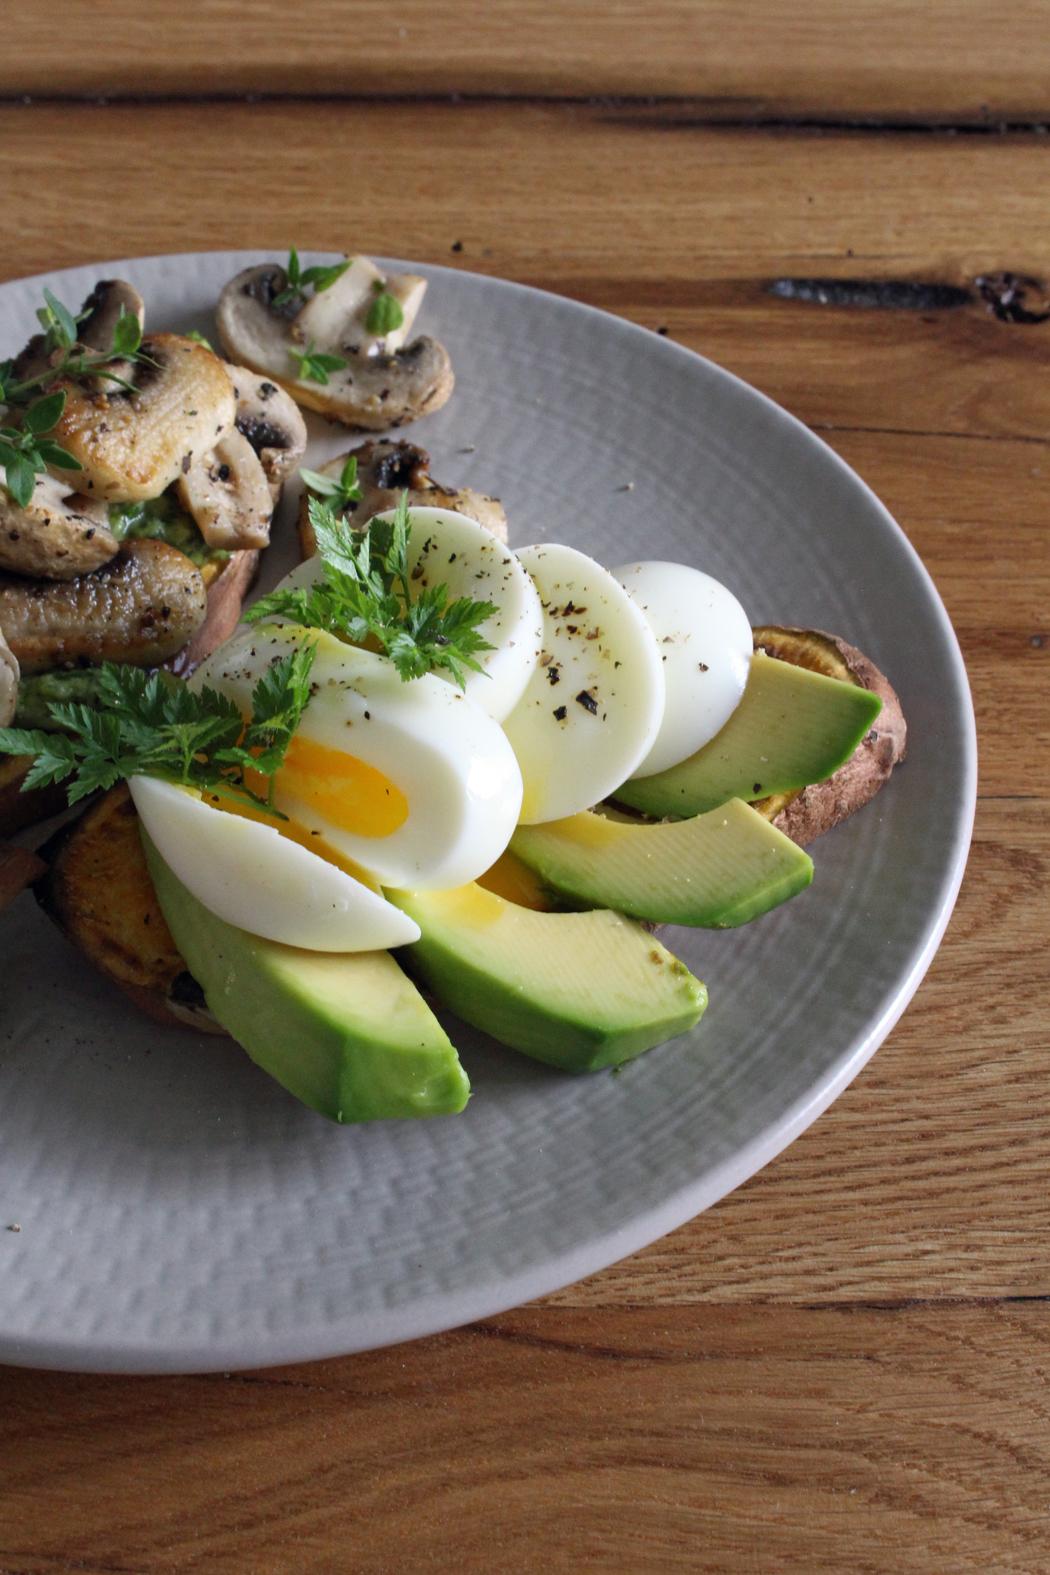 Süßkartoffel-Toast mit Avocado und Pilzen3